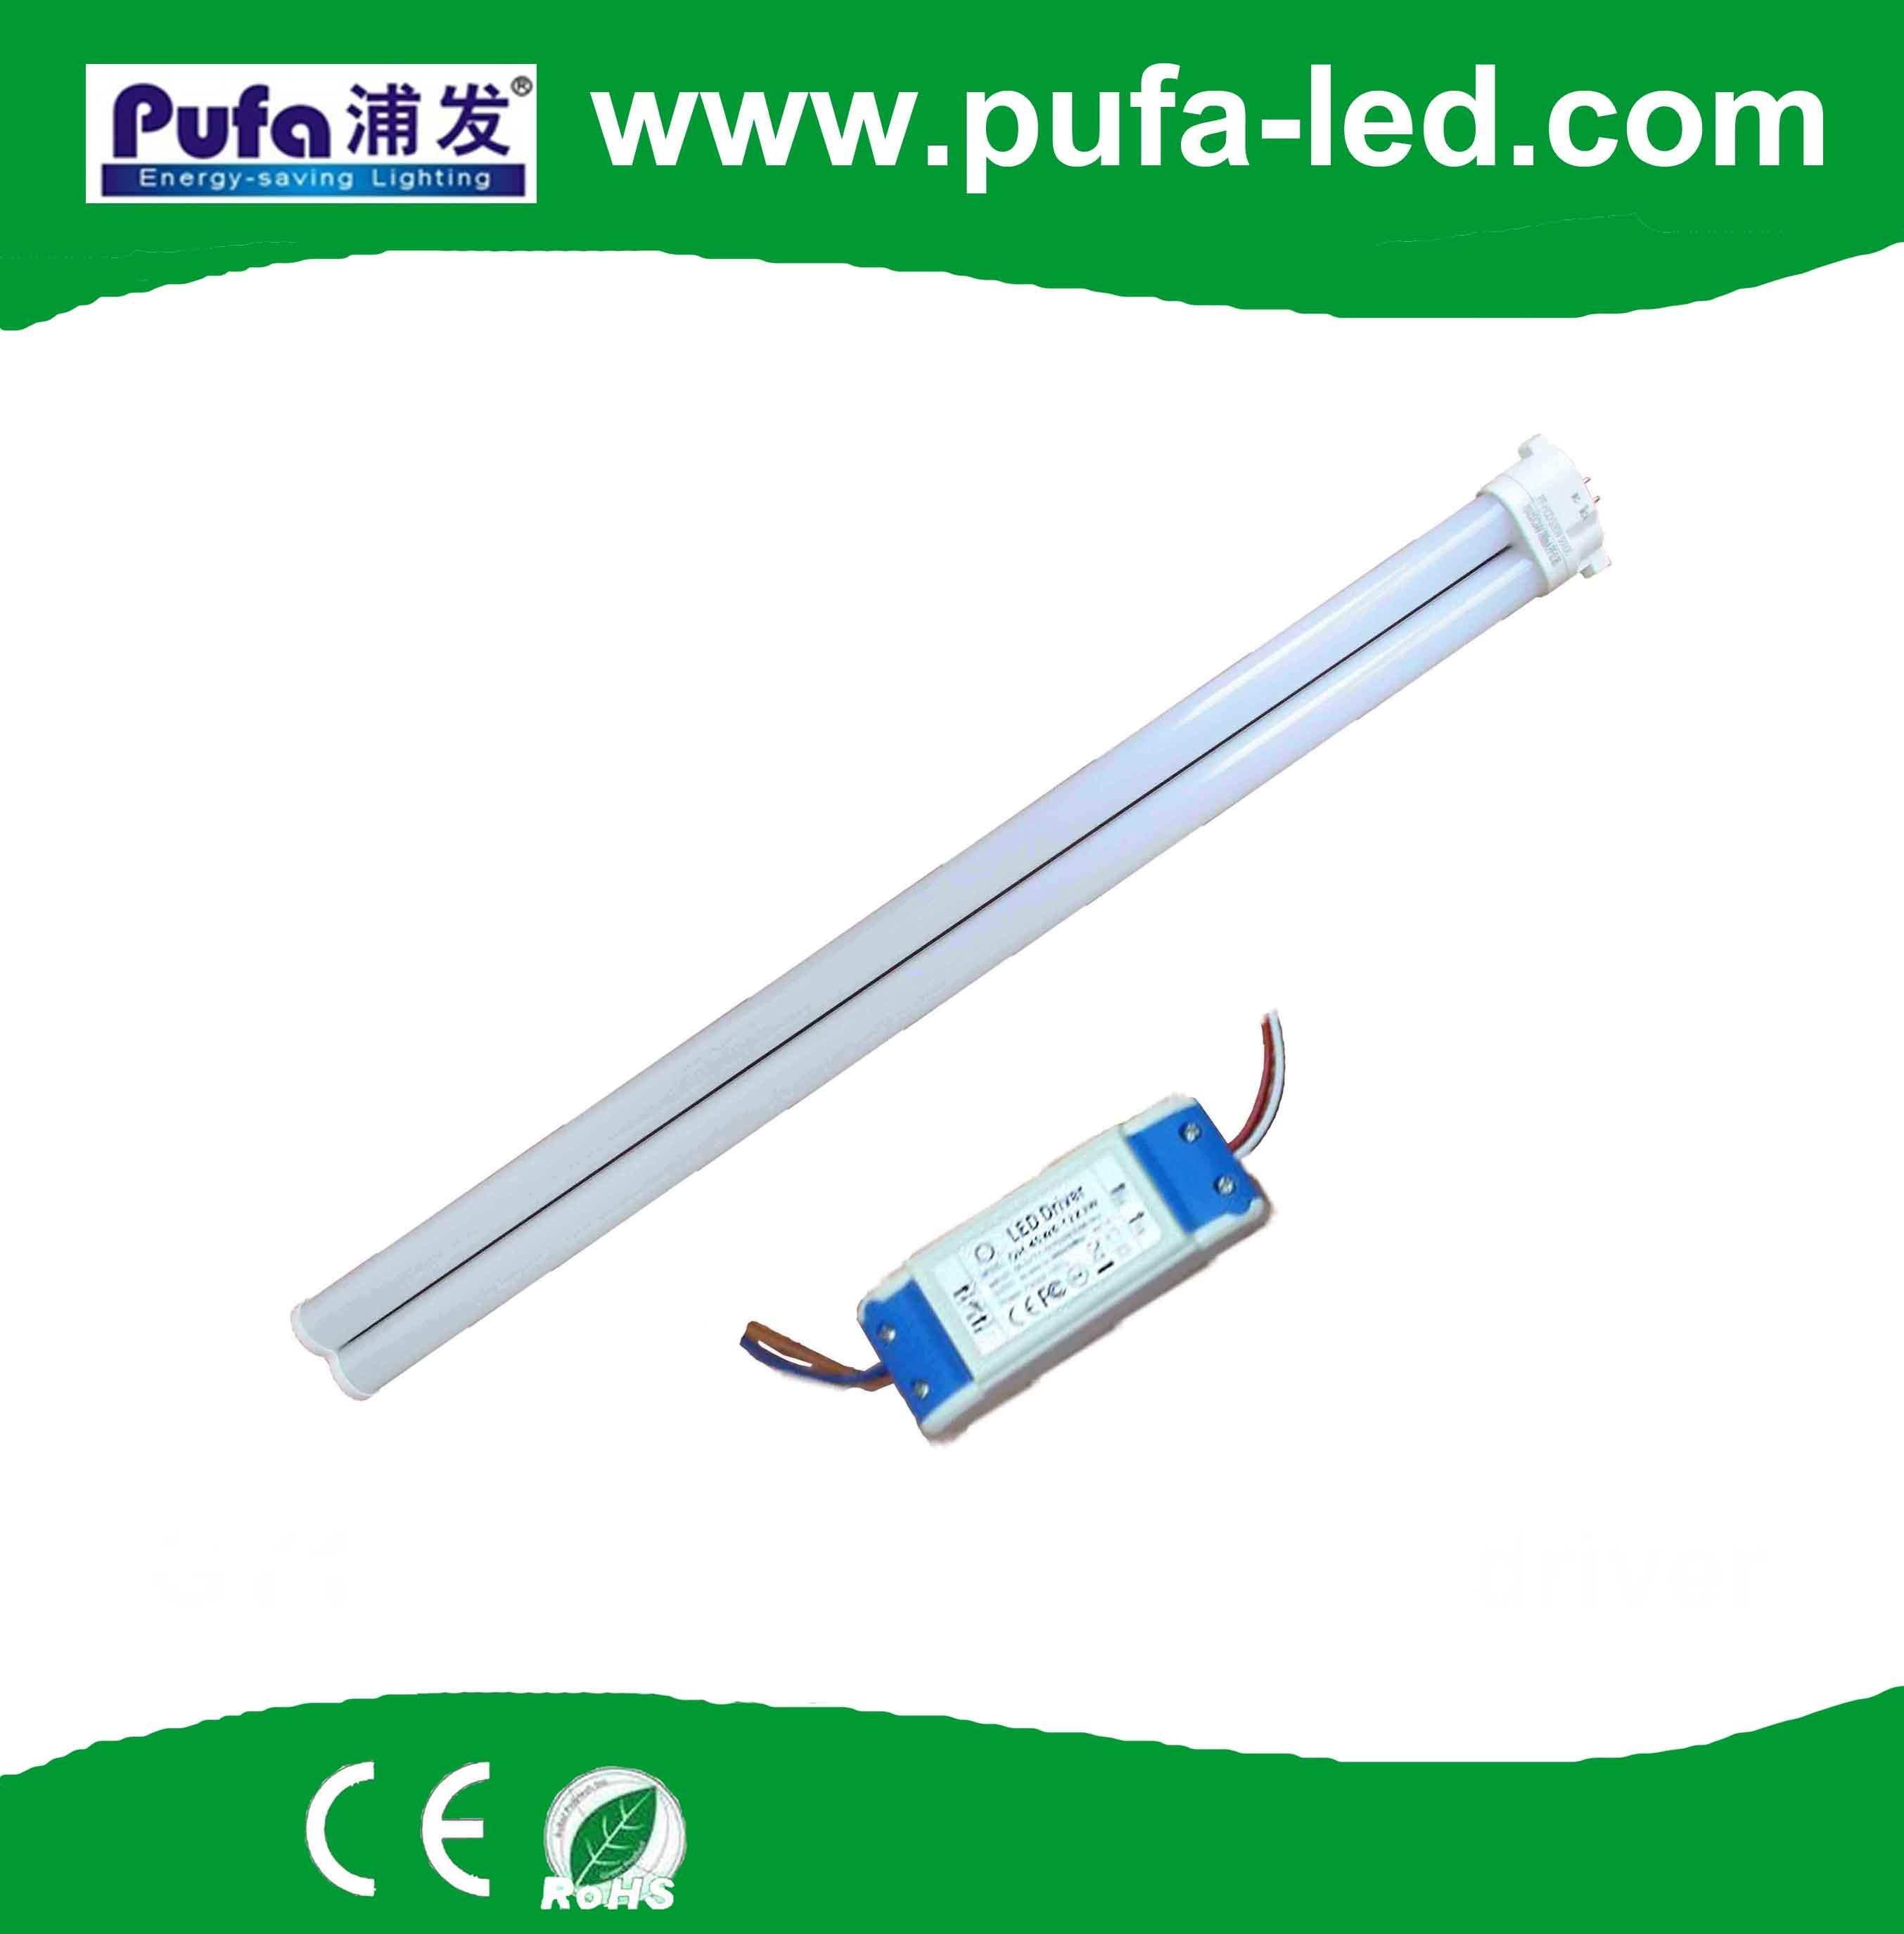 Hospital Lighting Pse Pl 13w Led Gy10q Fpl Lamp